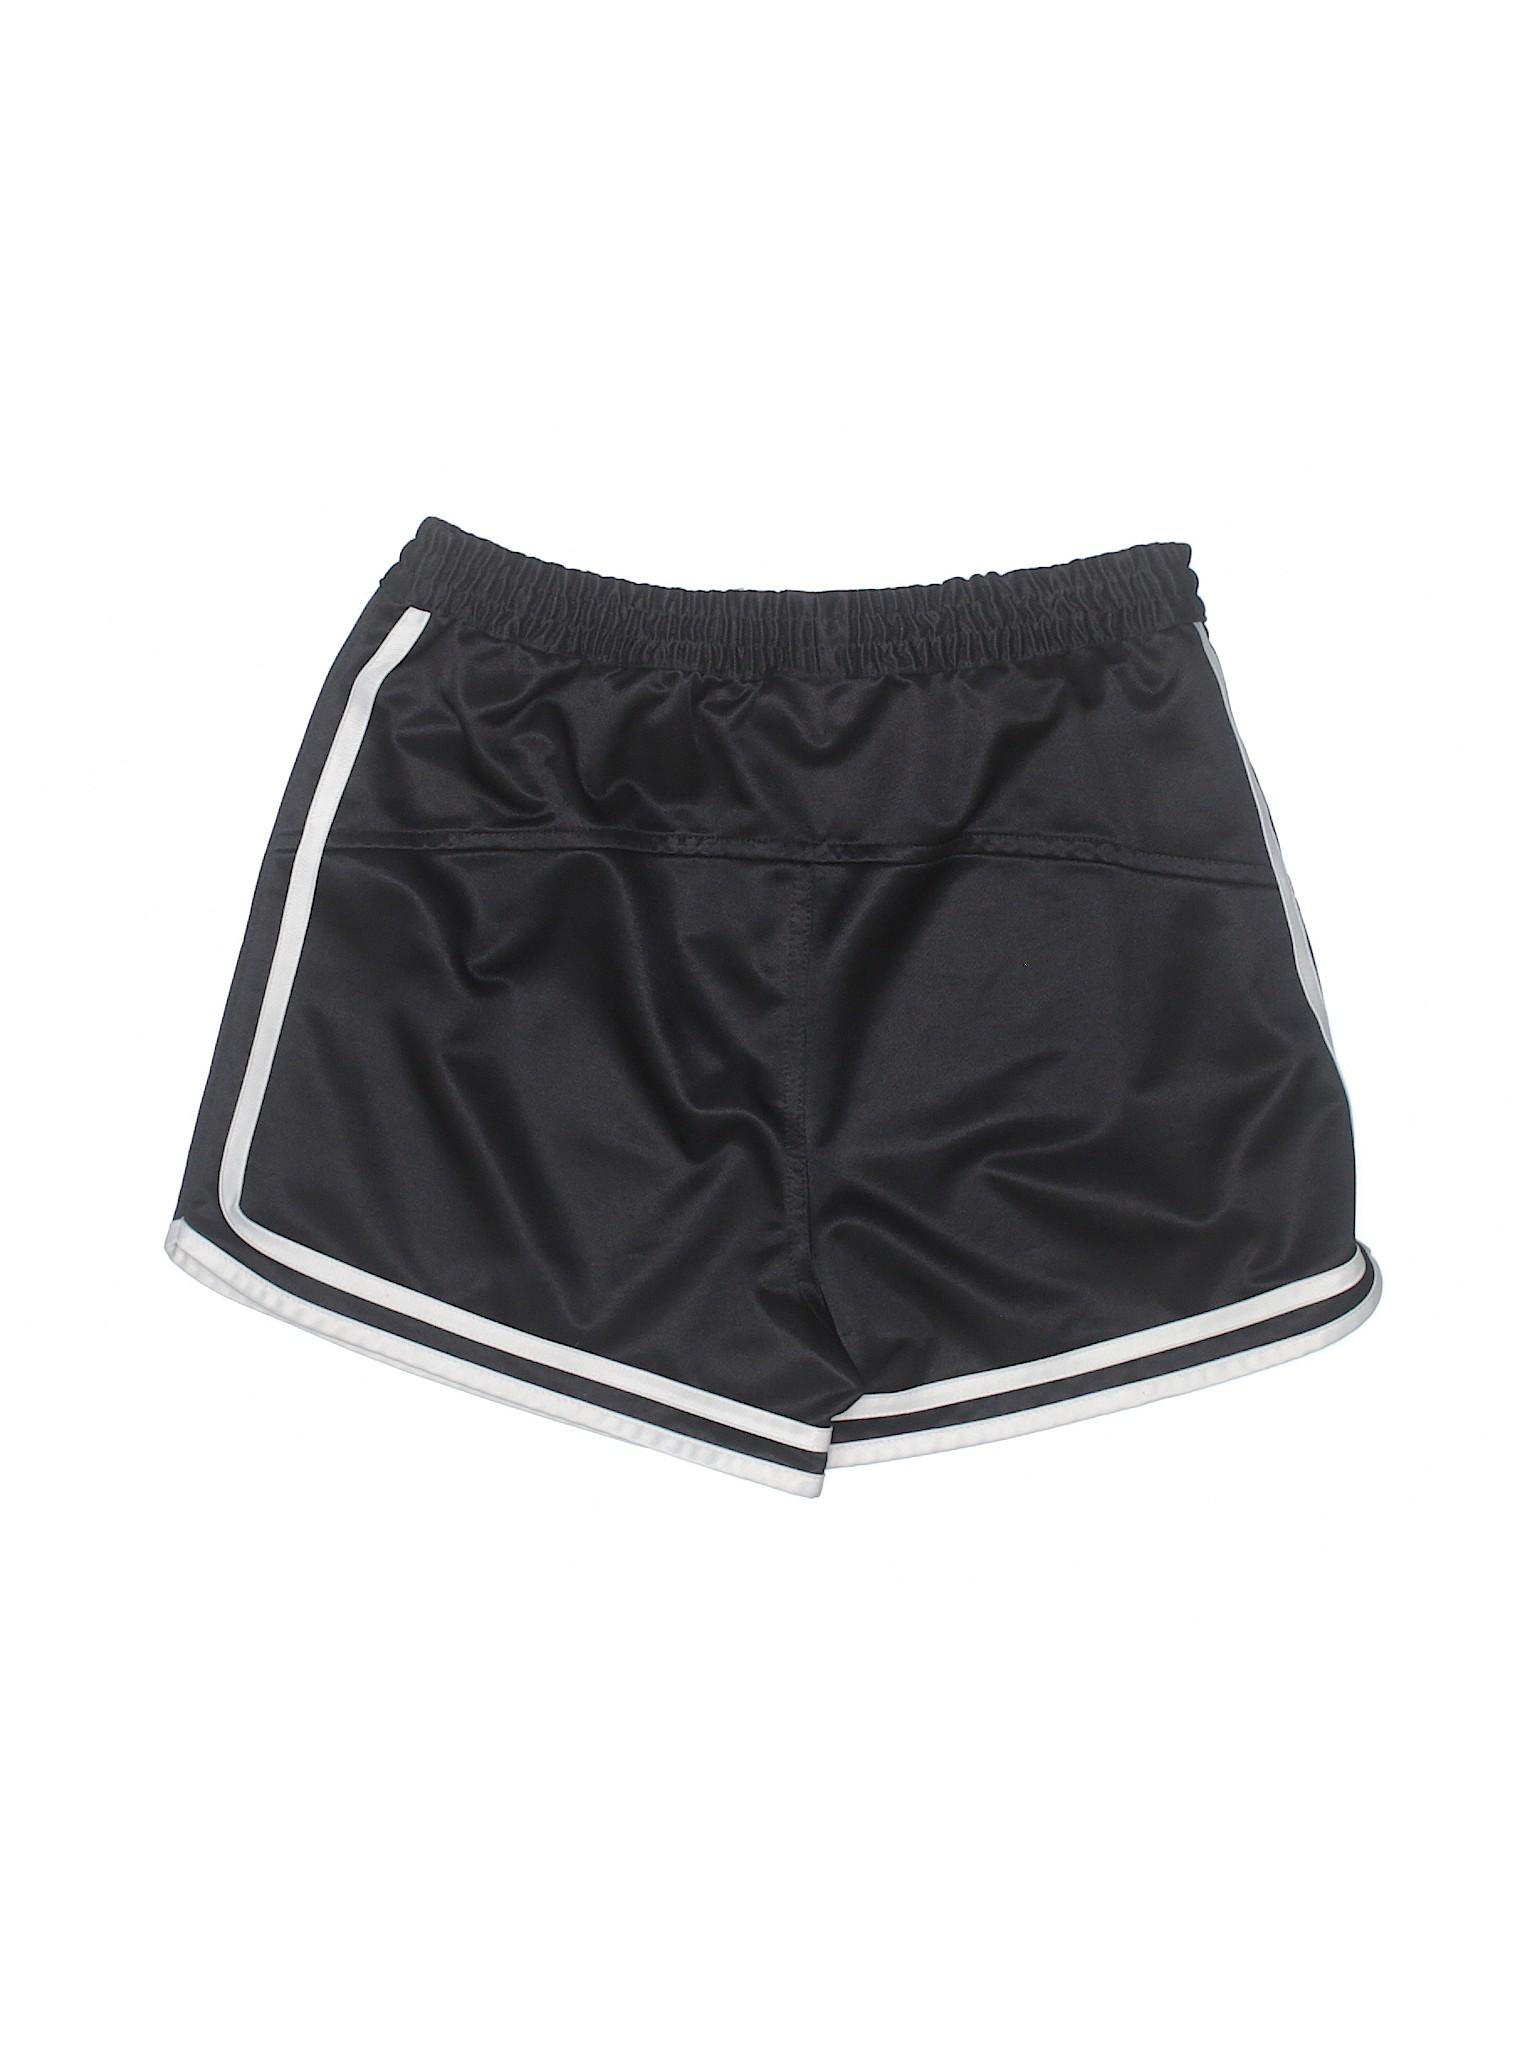 Boutique Reebok Athletic Reebok Shorts Boutique Boutique Boutique Athletic Reebok leisure leisure Shorts leisure leisure Athletic Shorts wrAqBHw